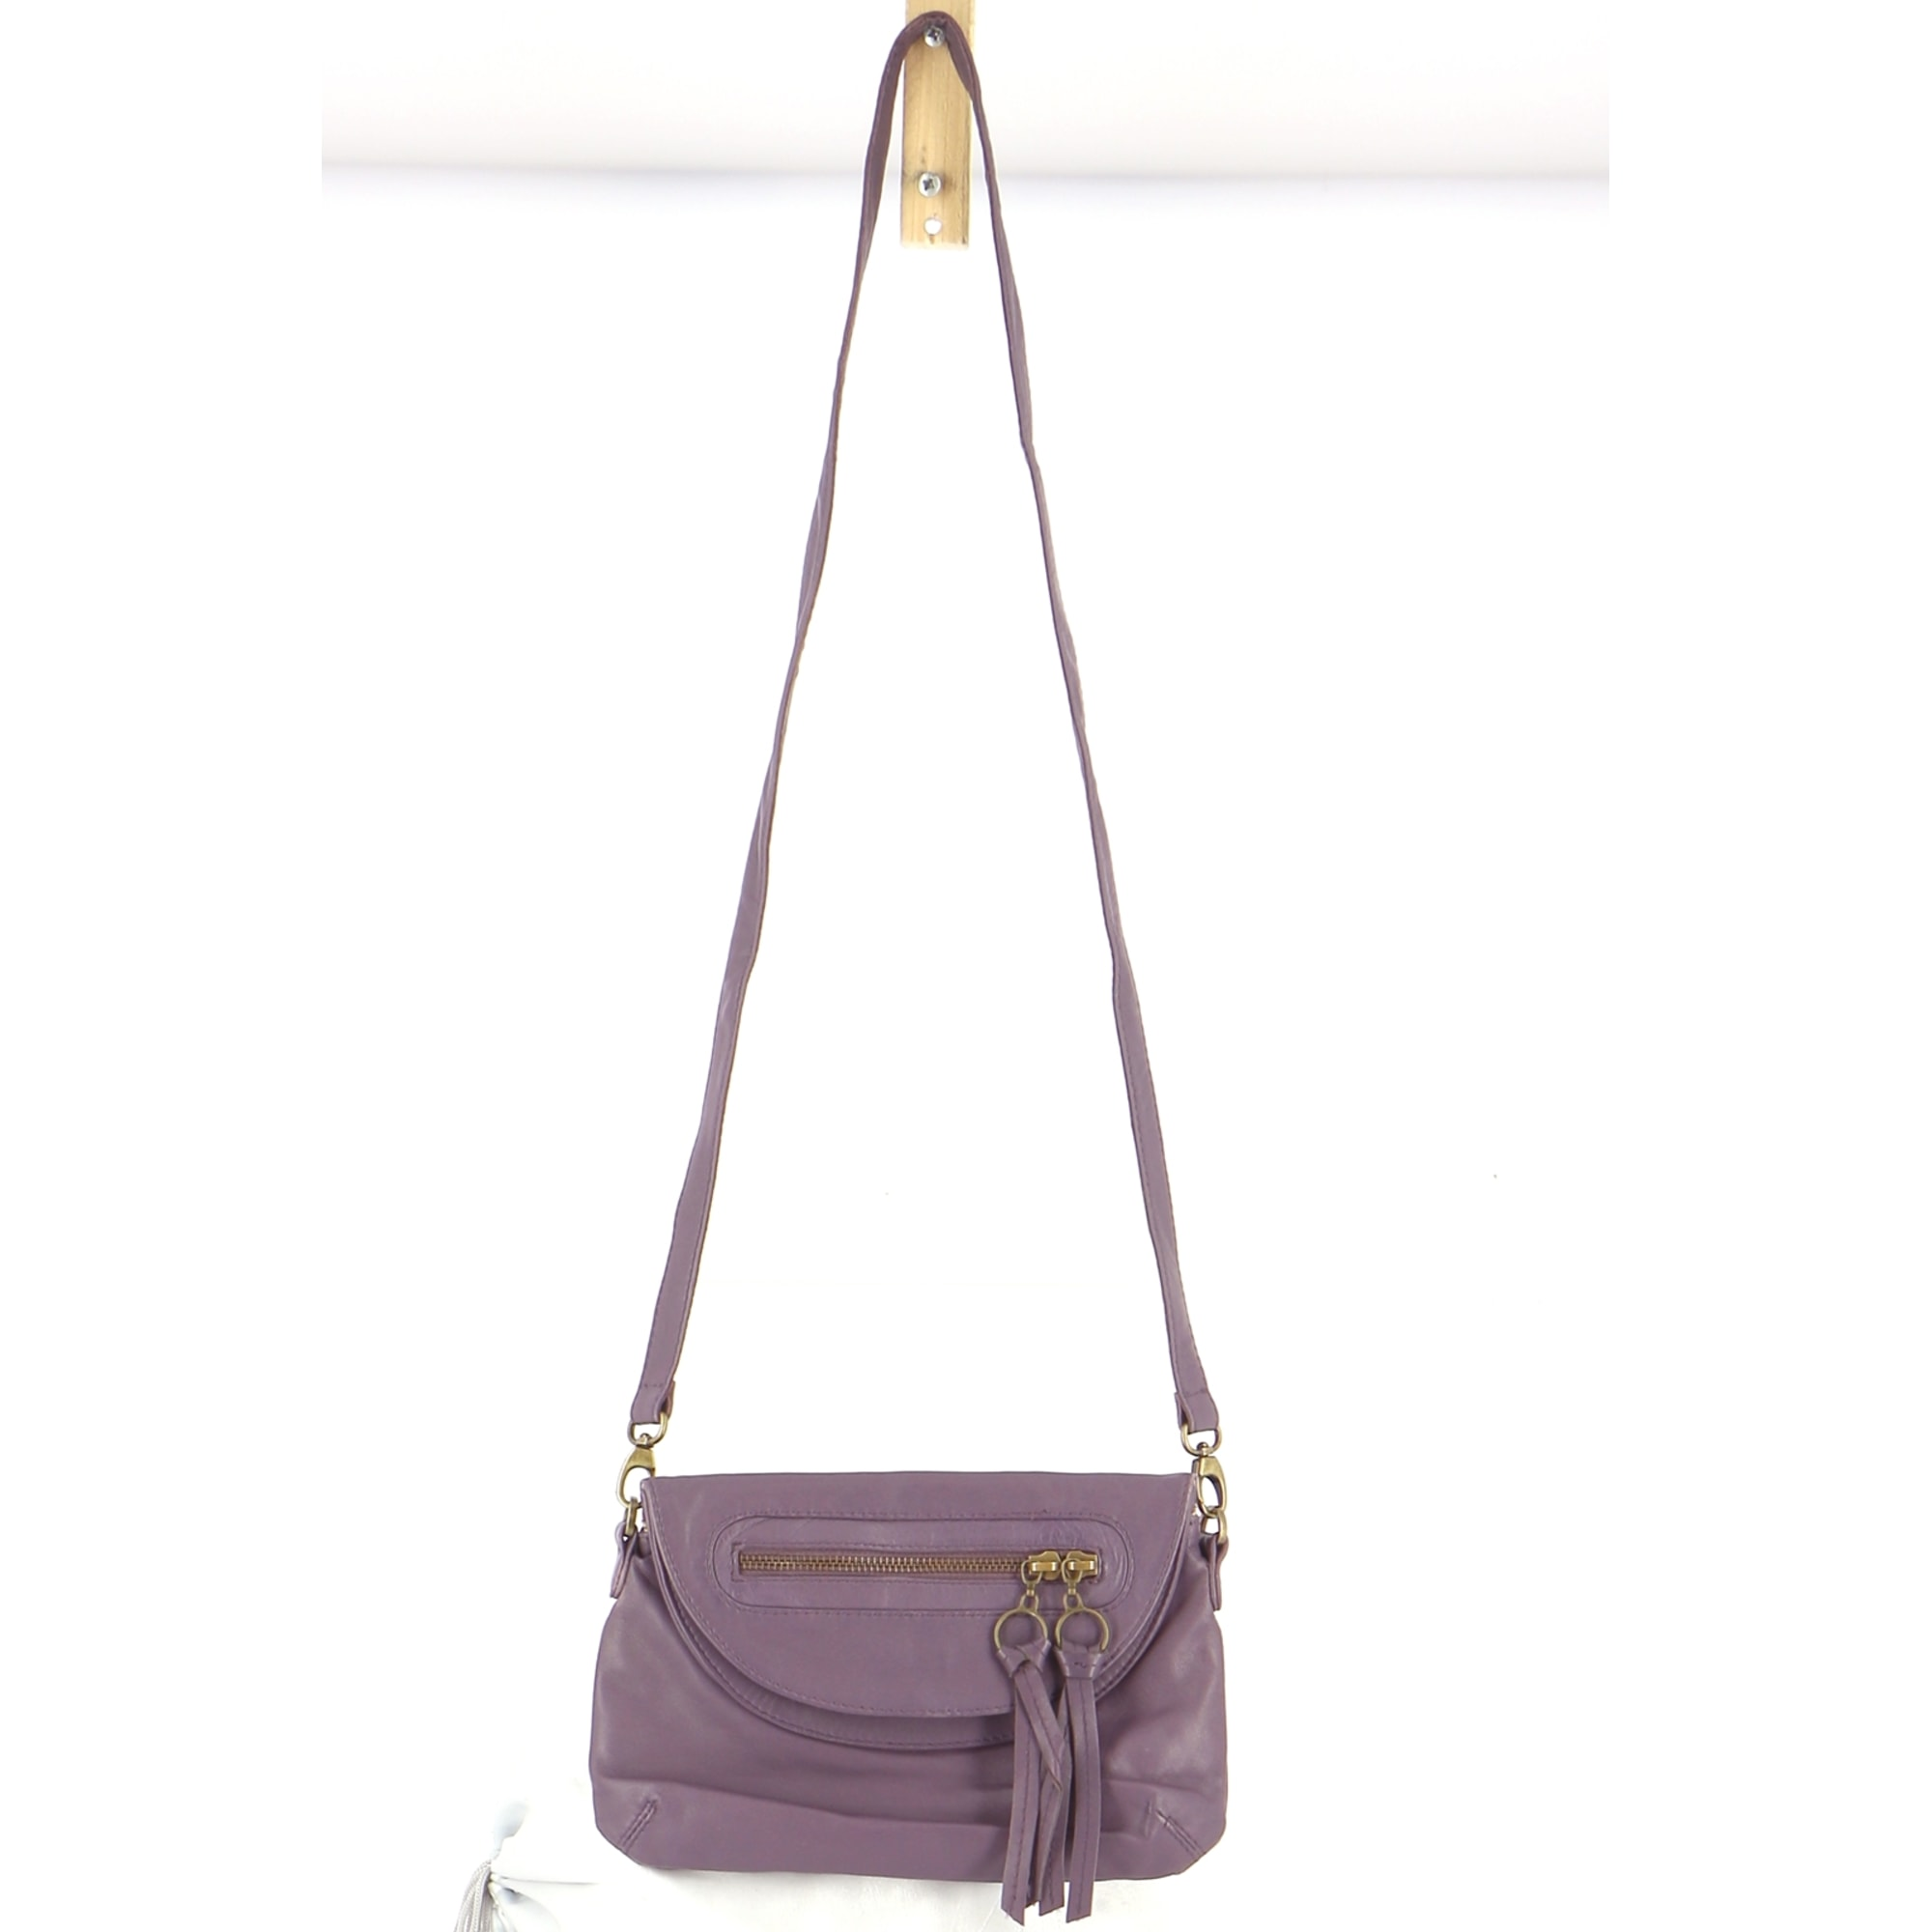 Lederhandtasche PETITE MENDIGOTE Violett, malvenfarben, lavendelfarben